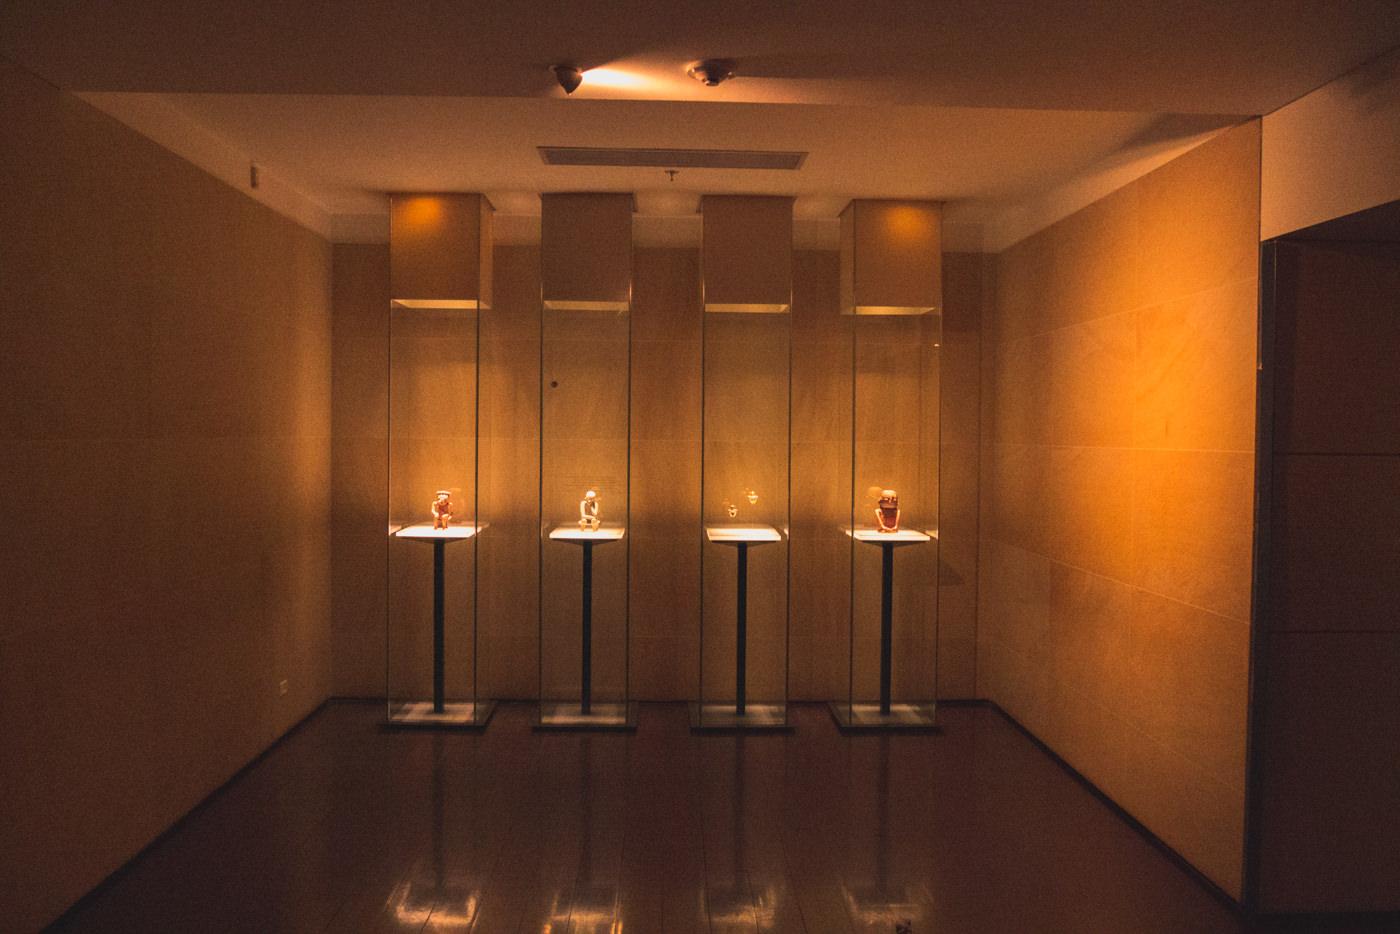 Museo del Oro in Bogotá